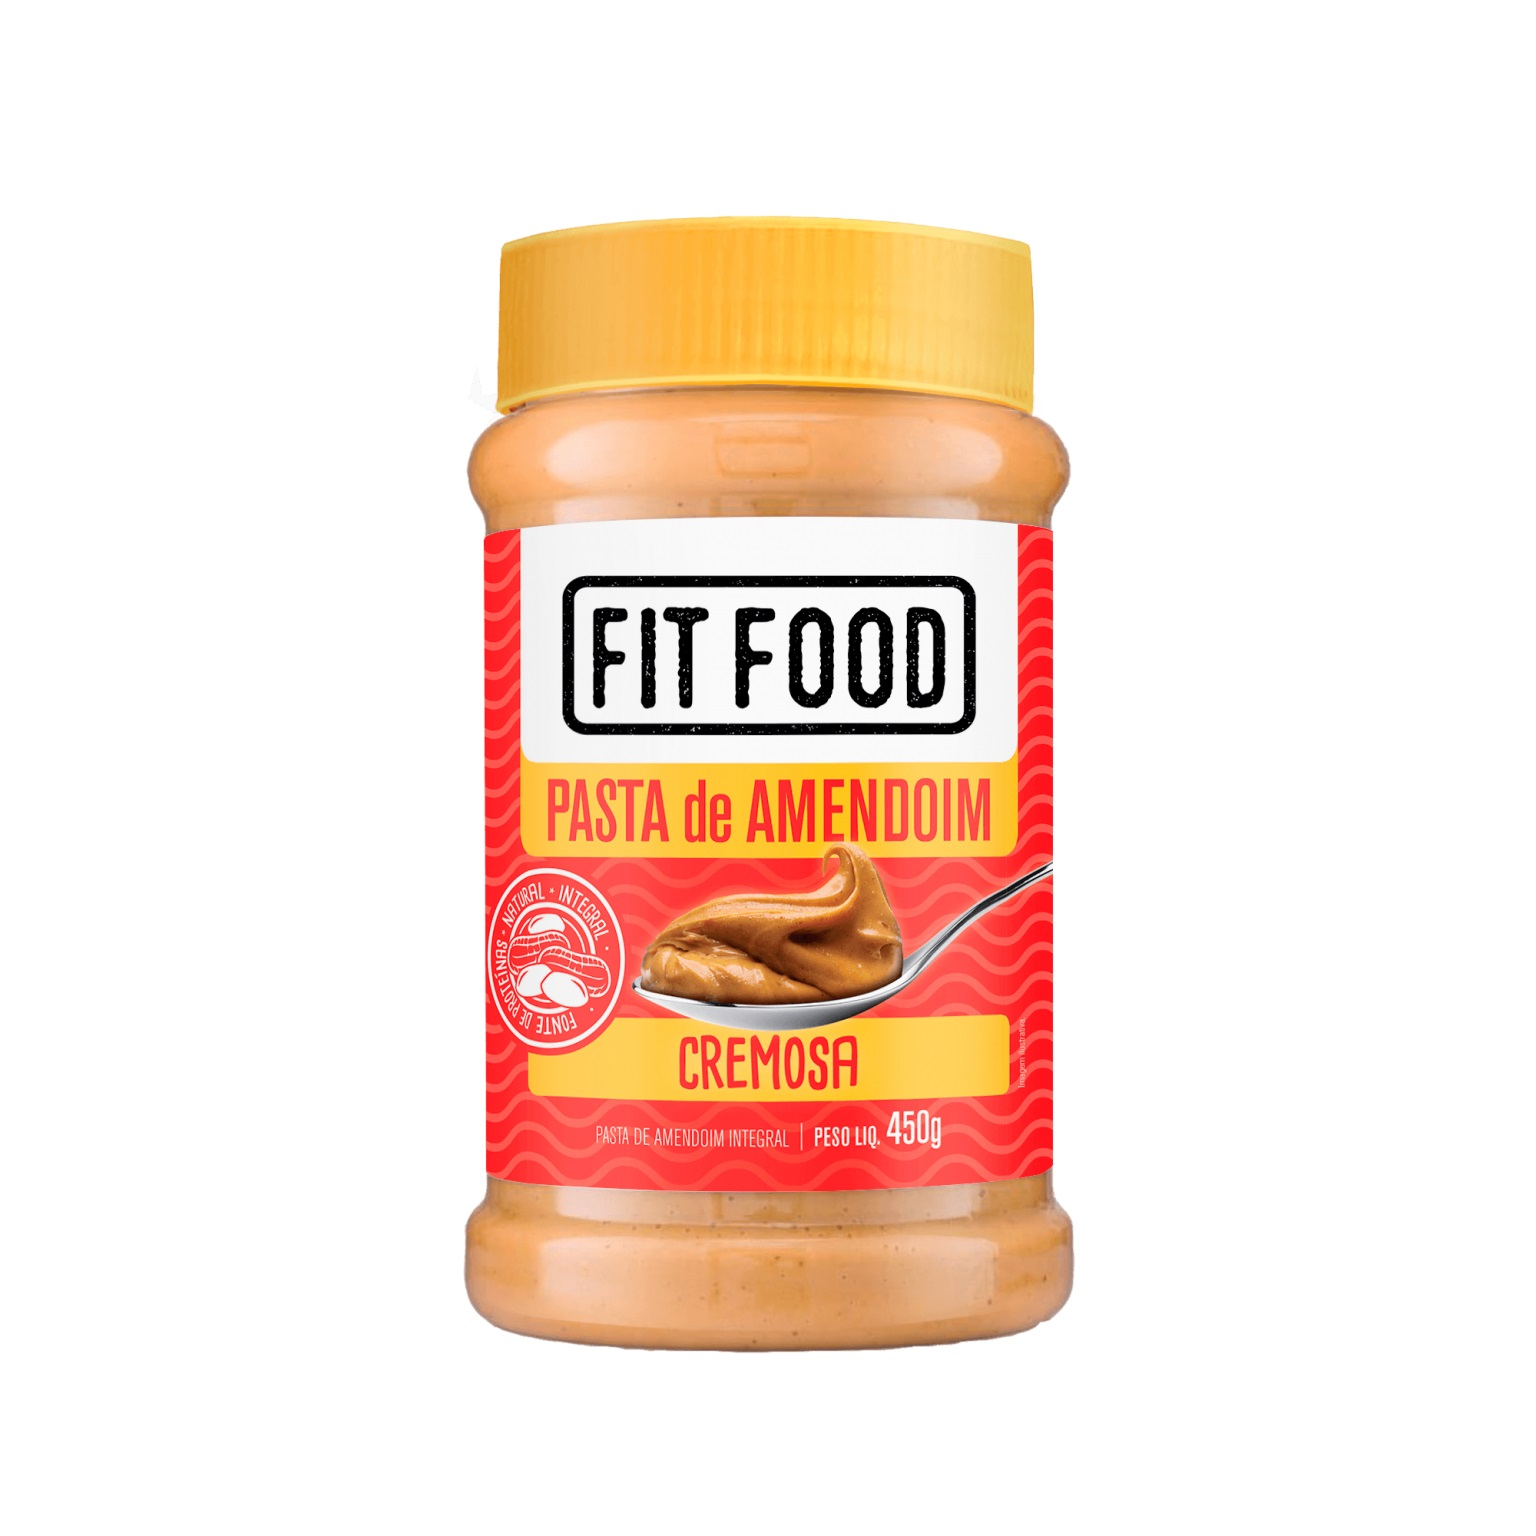 Pasta de Amendoim Cremosa (450g) - Fit Food